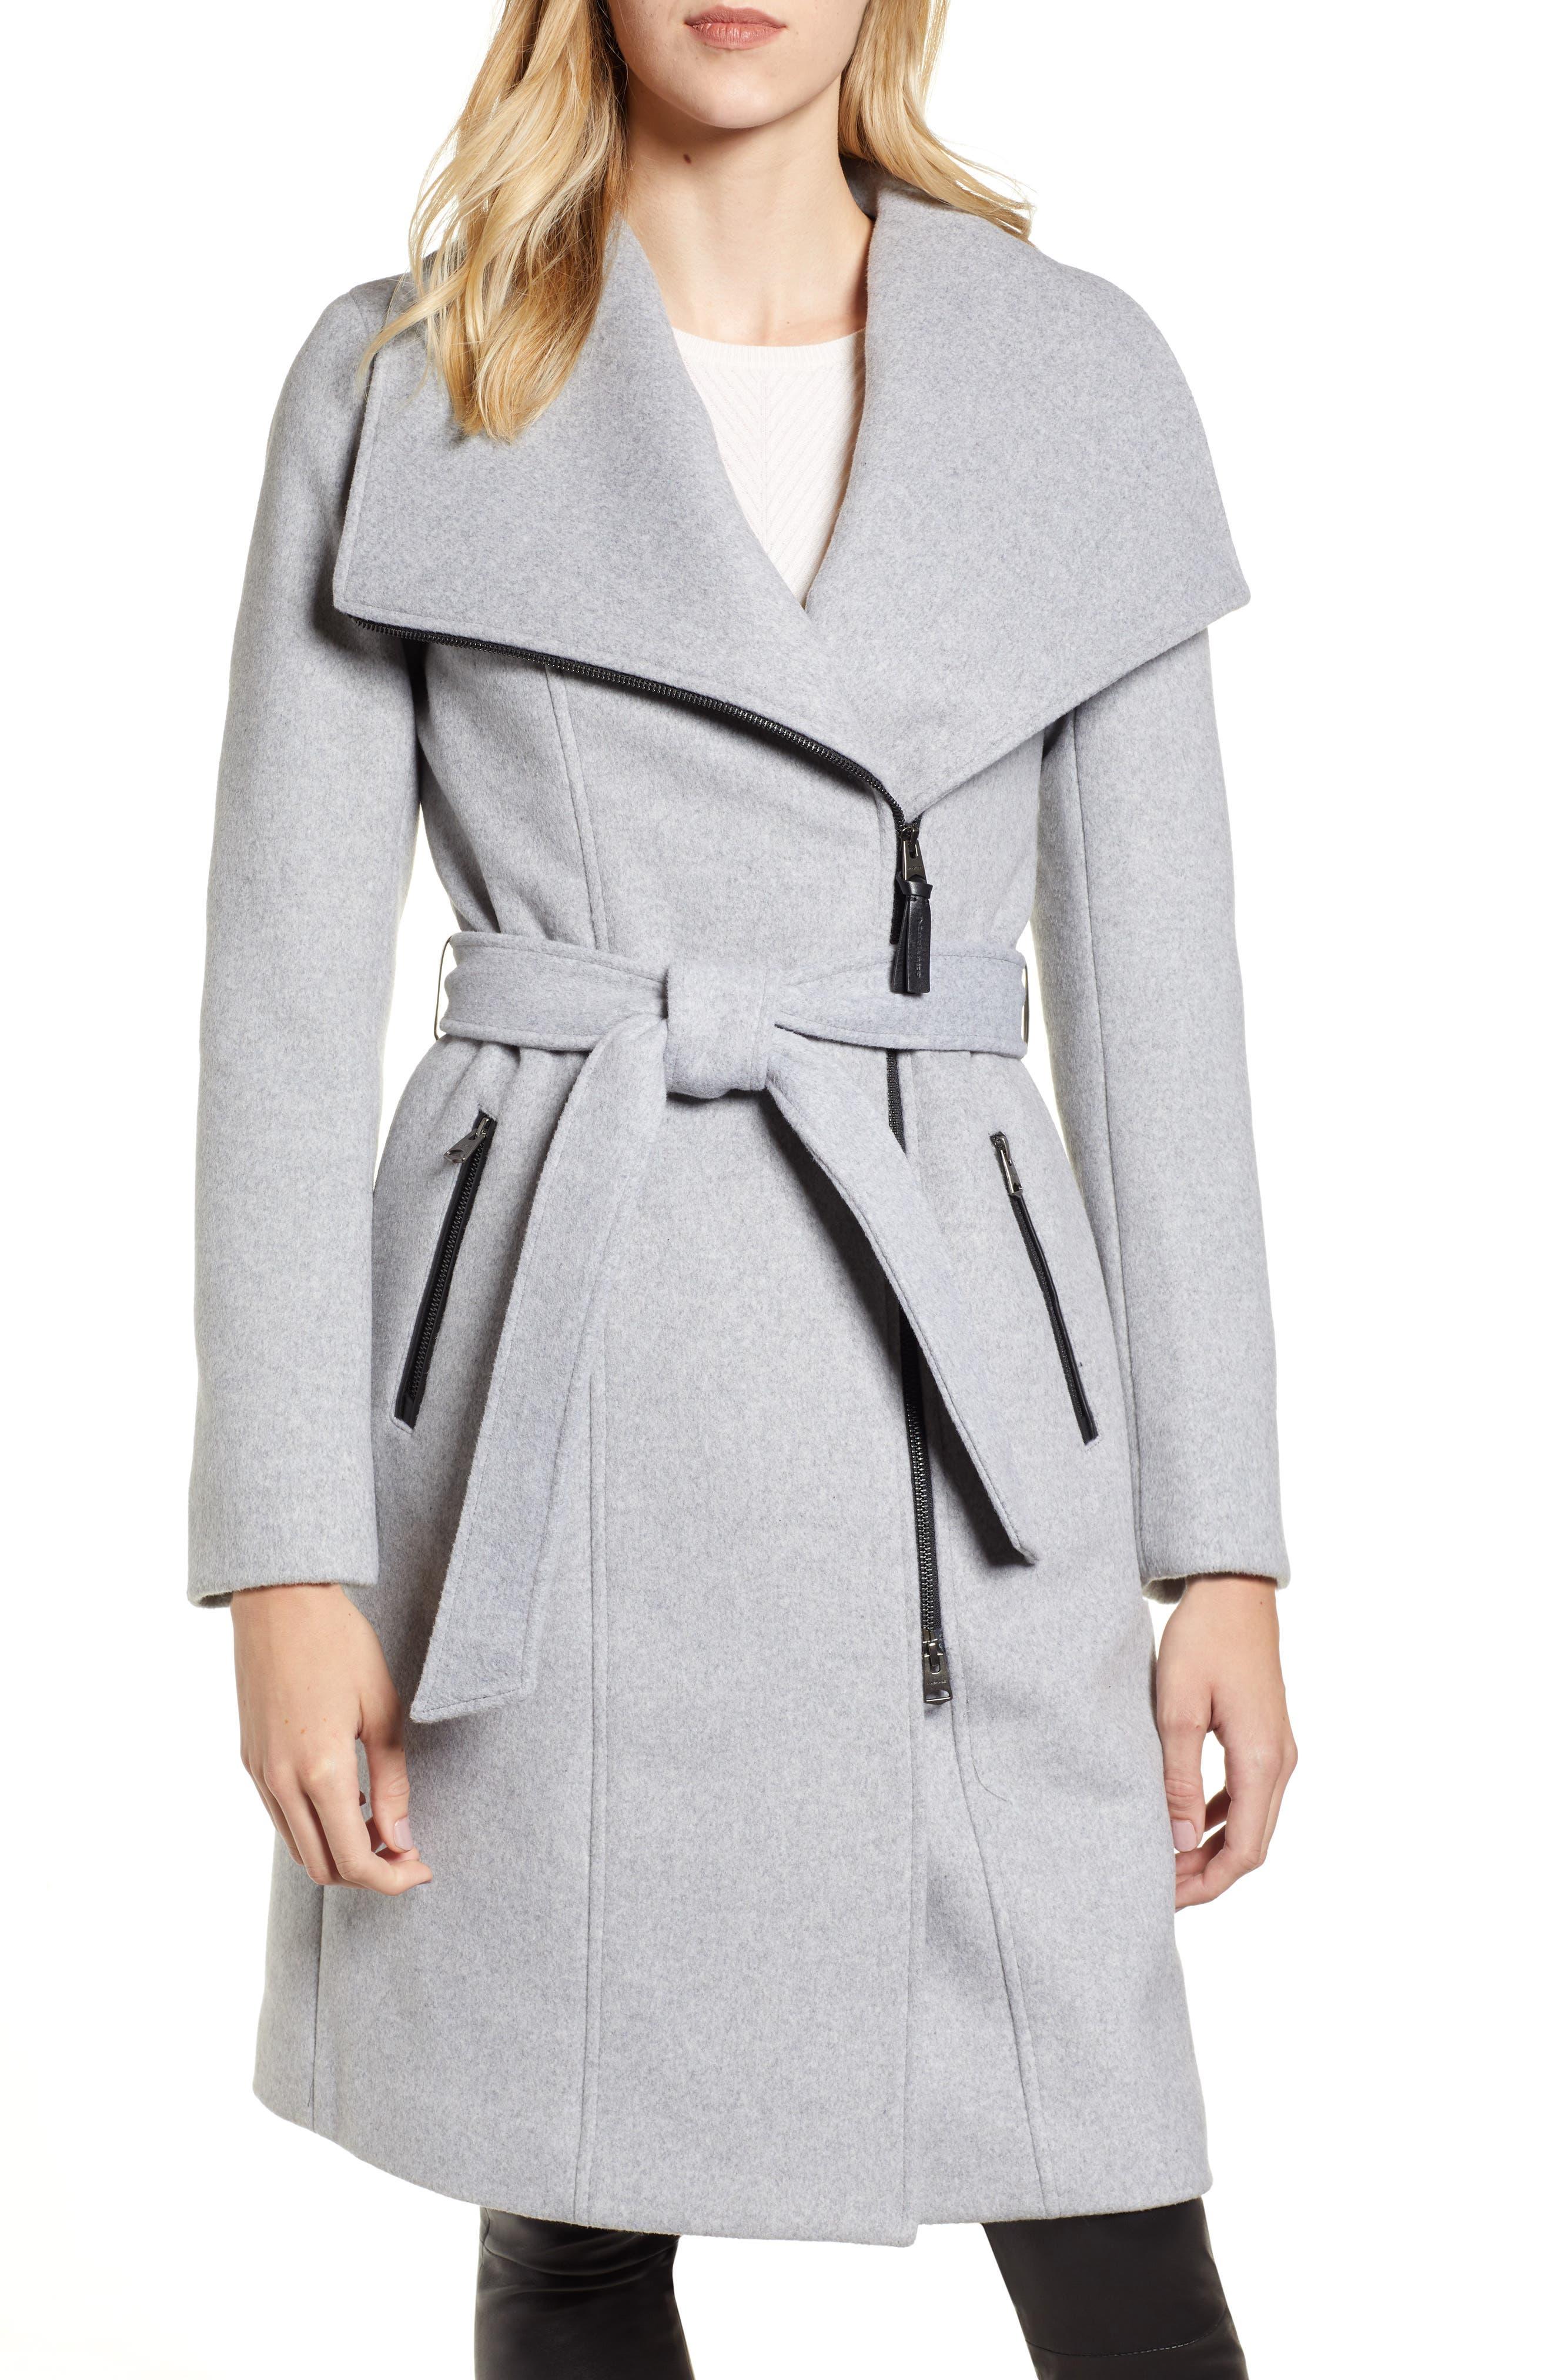 MACKAGE, Nori Belted Wool Blend Coat, Alternate thumbnail 5, color, LIGHT GREY